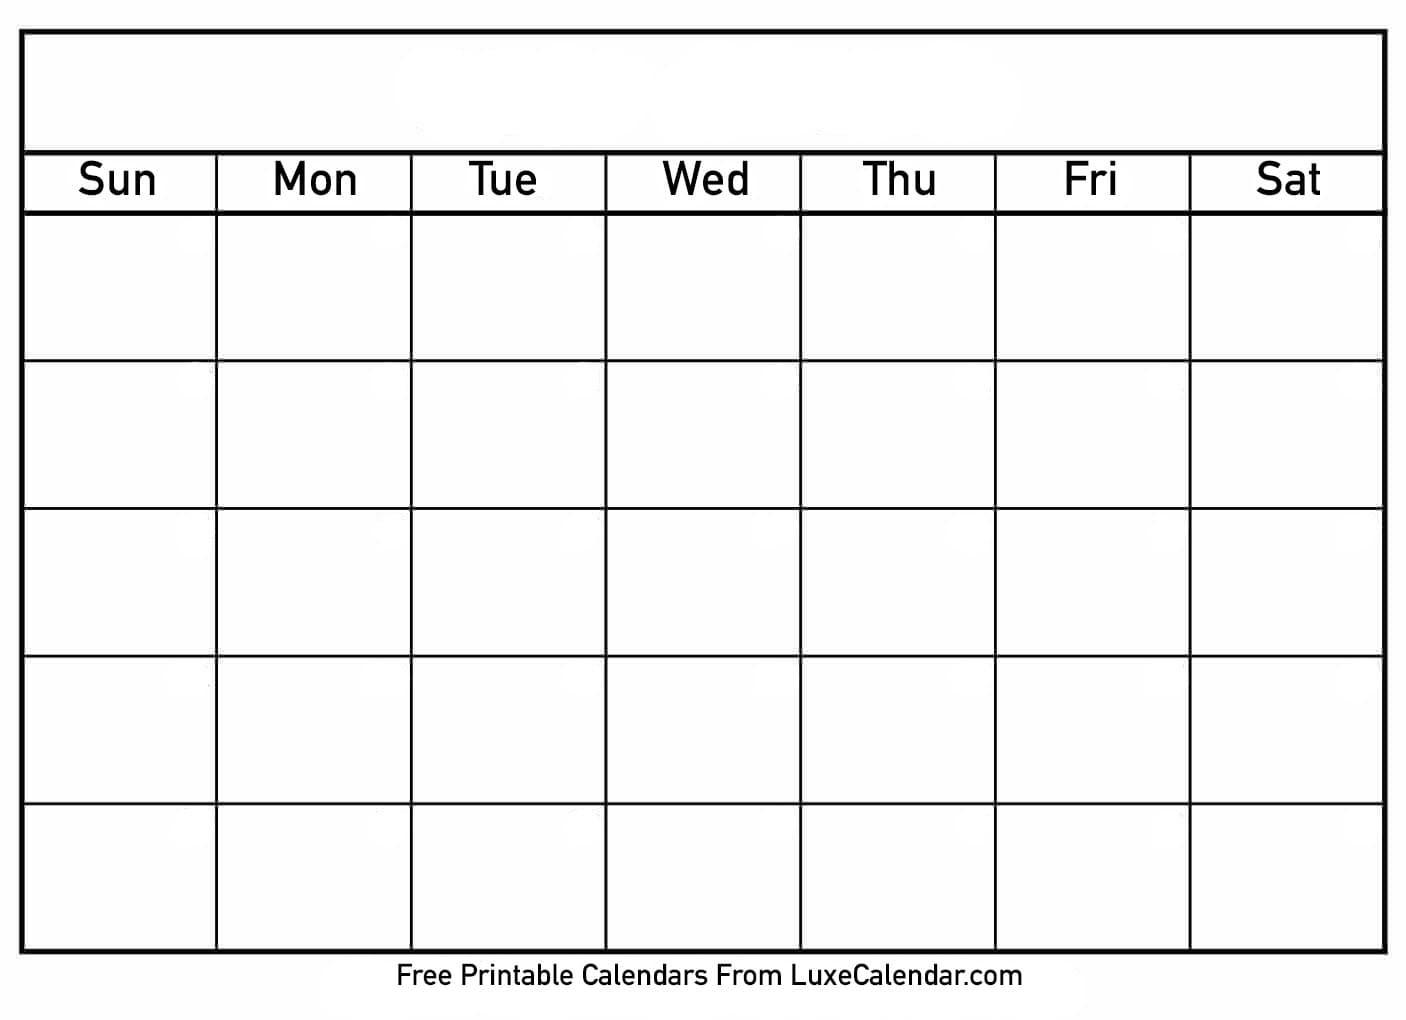 Blank Printable Calendar - Luxe Calendar  Free Printable Blank Calendars To Fill In